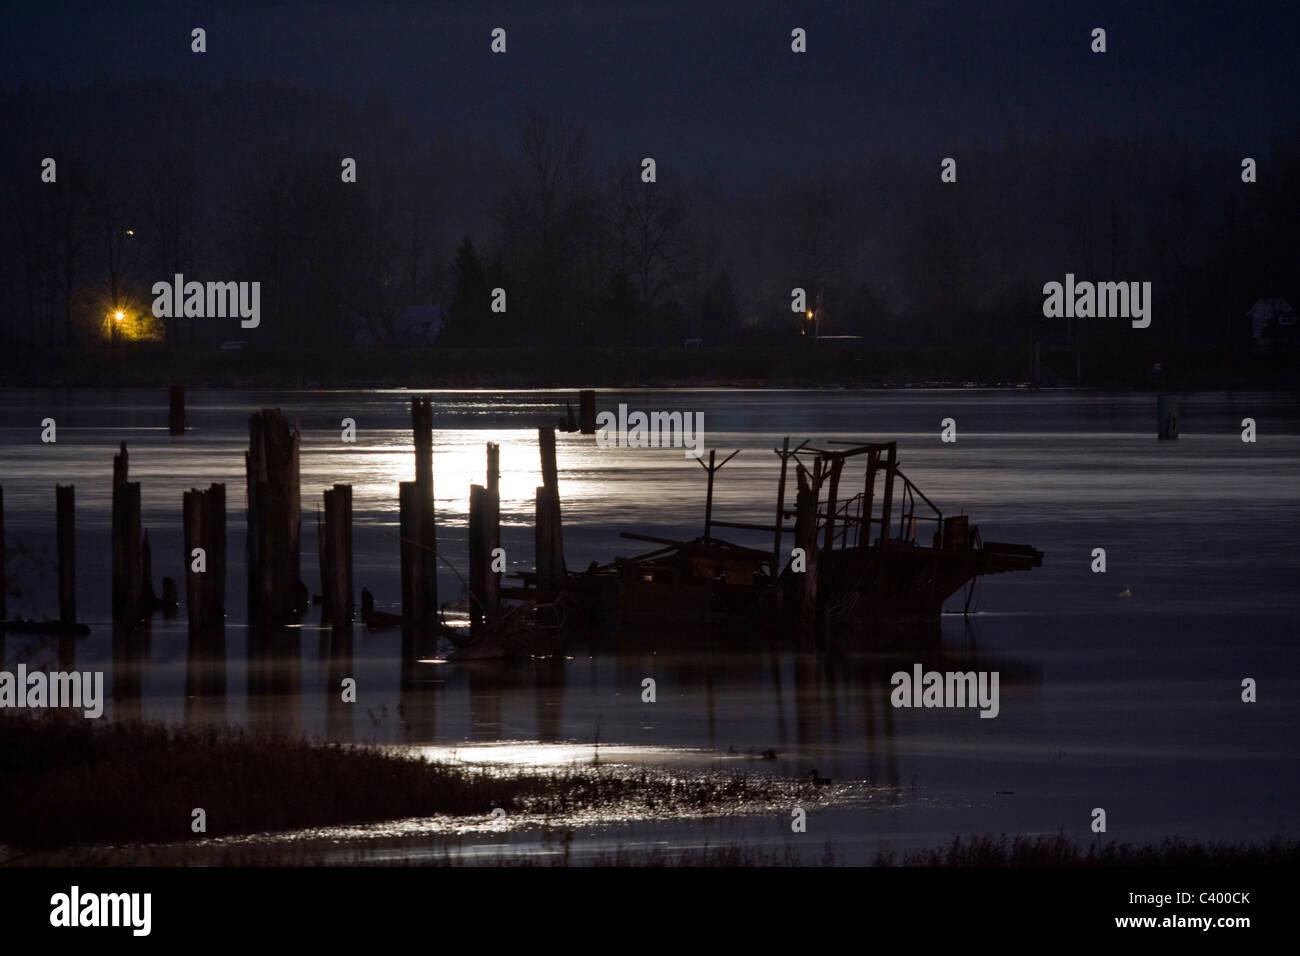 Full moon illuminates wreckage in the Pitt River, Port Coquitlam, BC, Canada - Stock Image